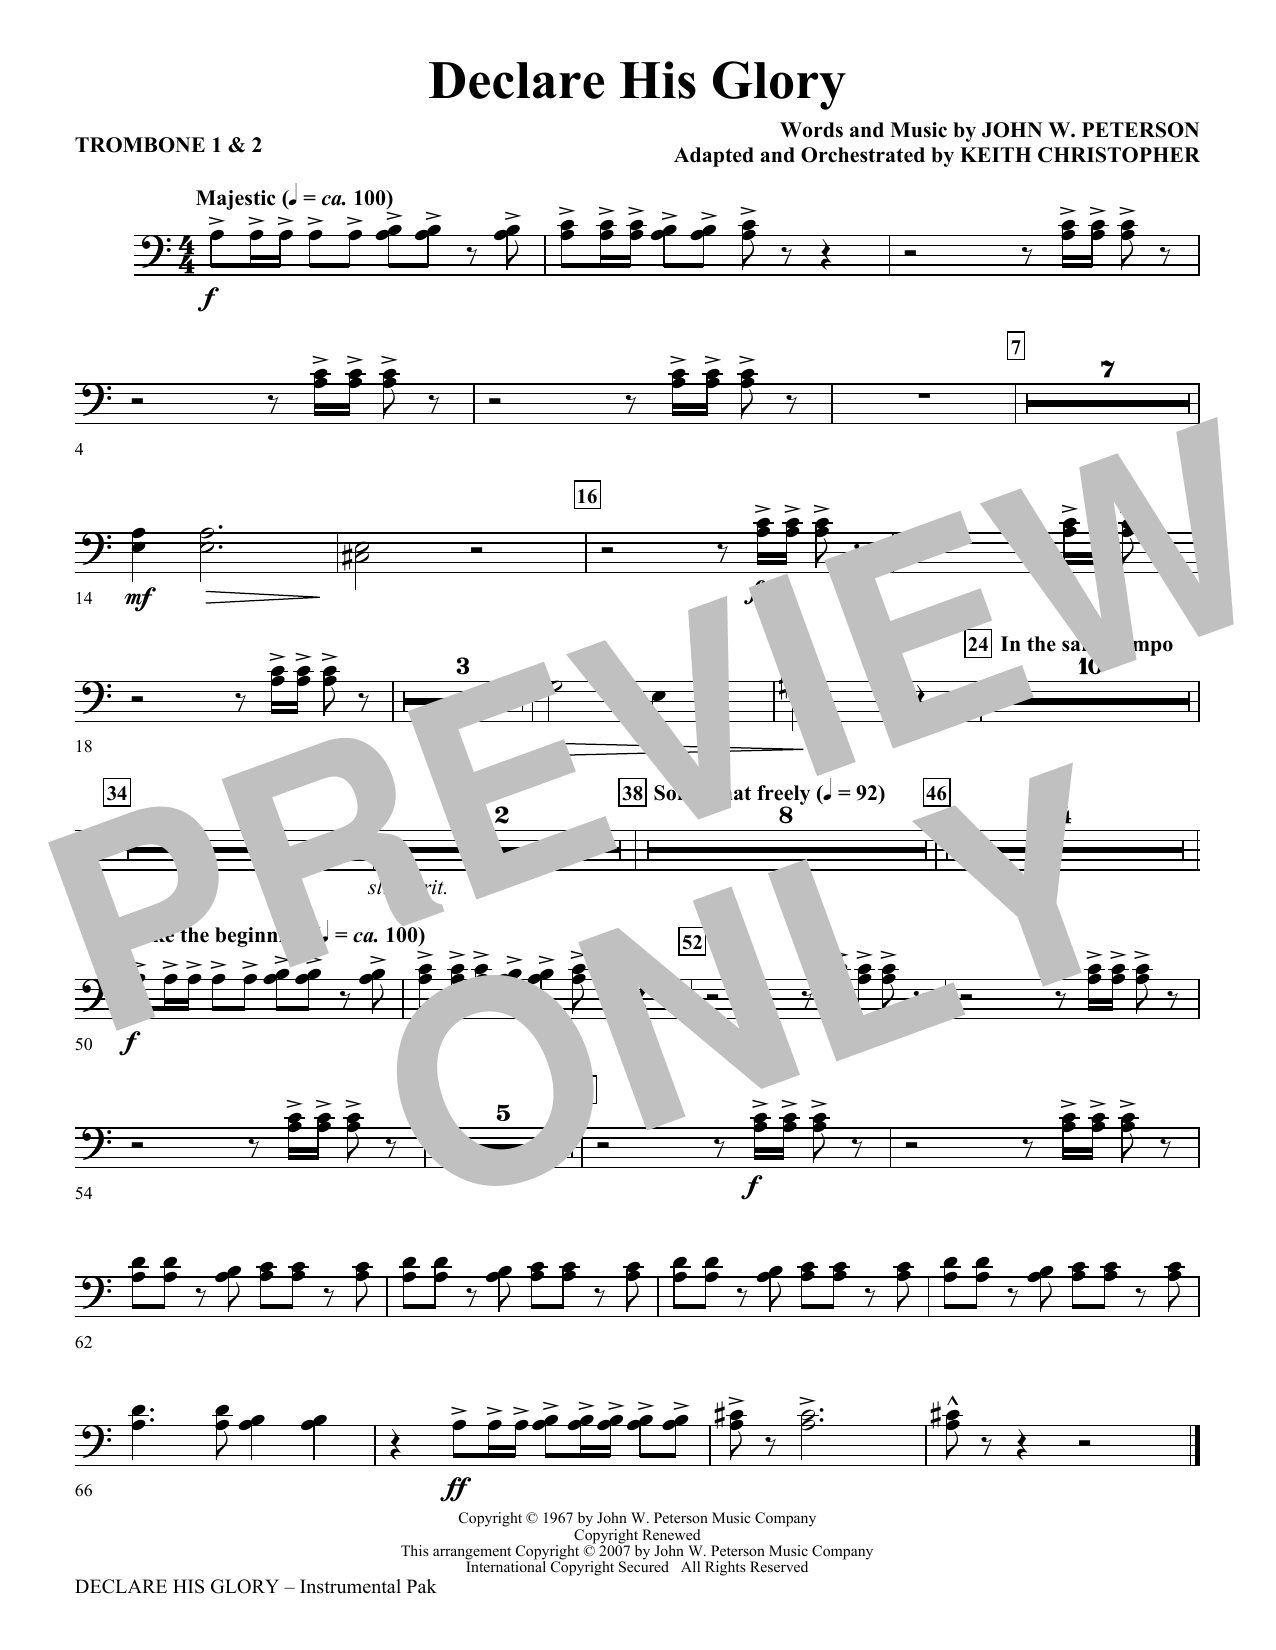 Declare His Glory - Trombone 1 & 2 Partition Digitale